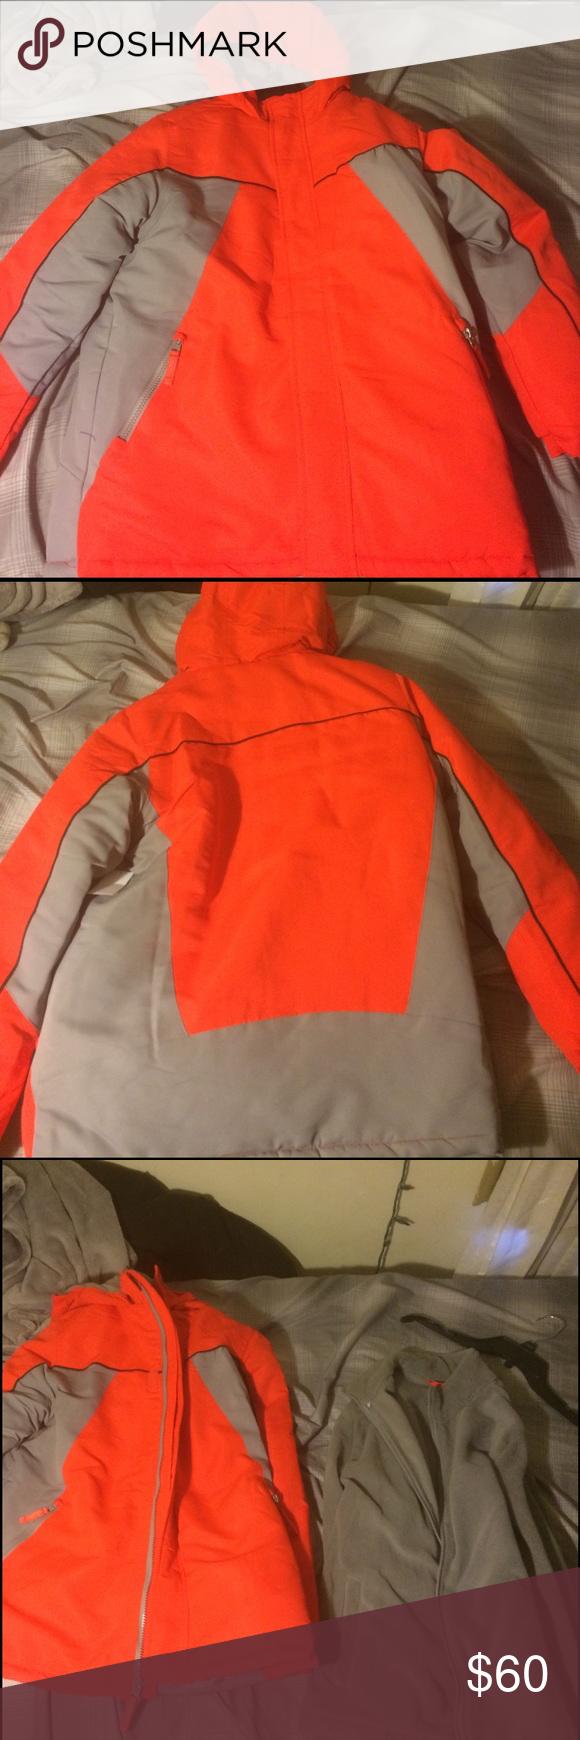 Heavy coat nwt gray jacket winter time and orange grey